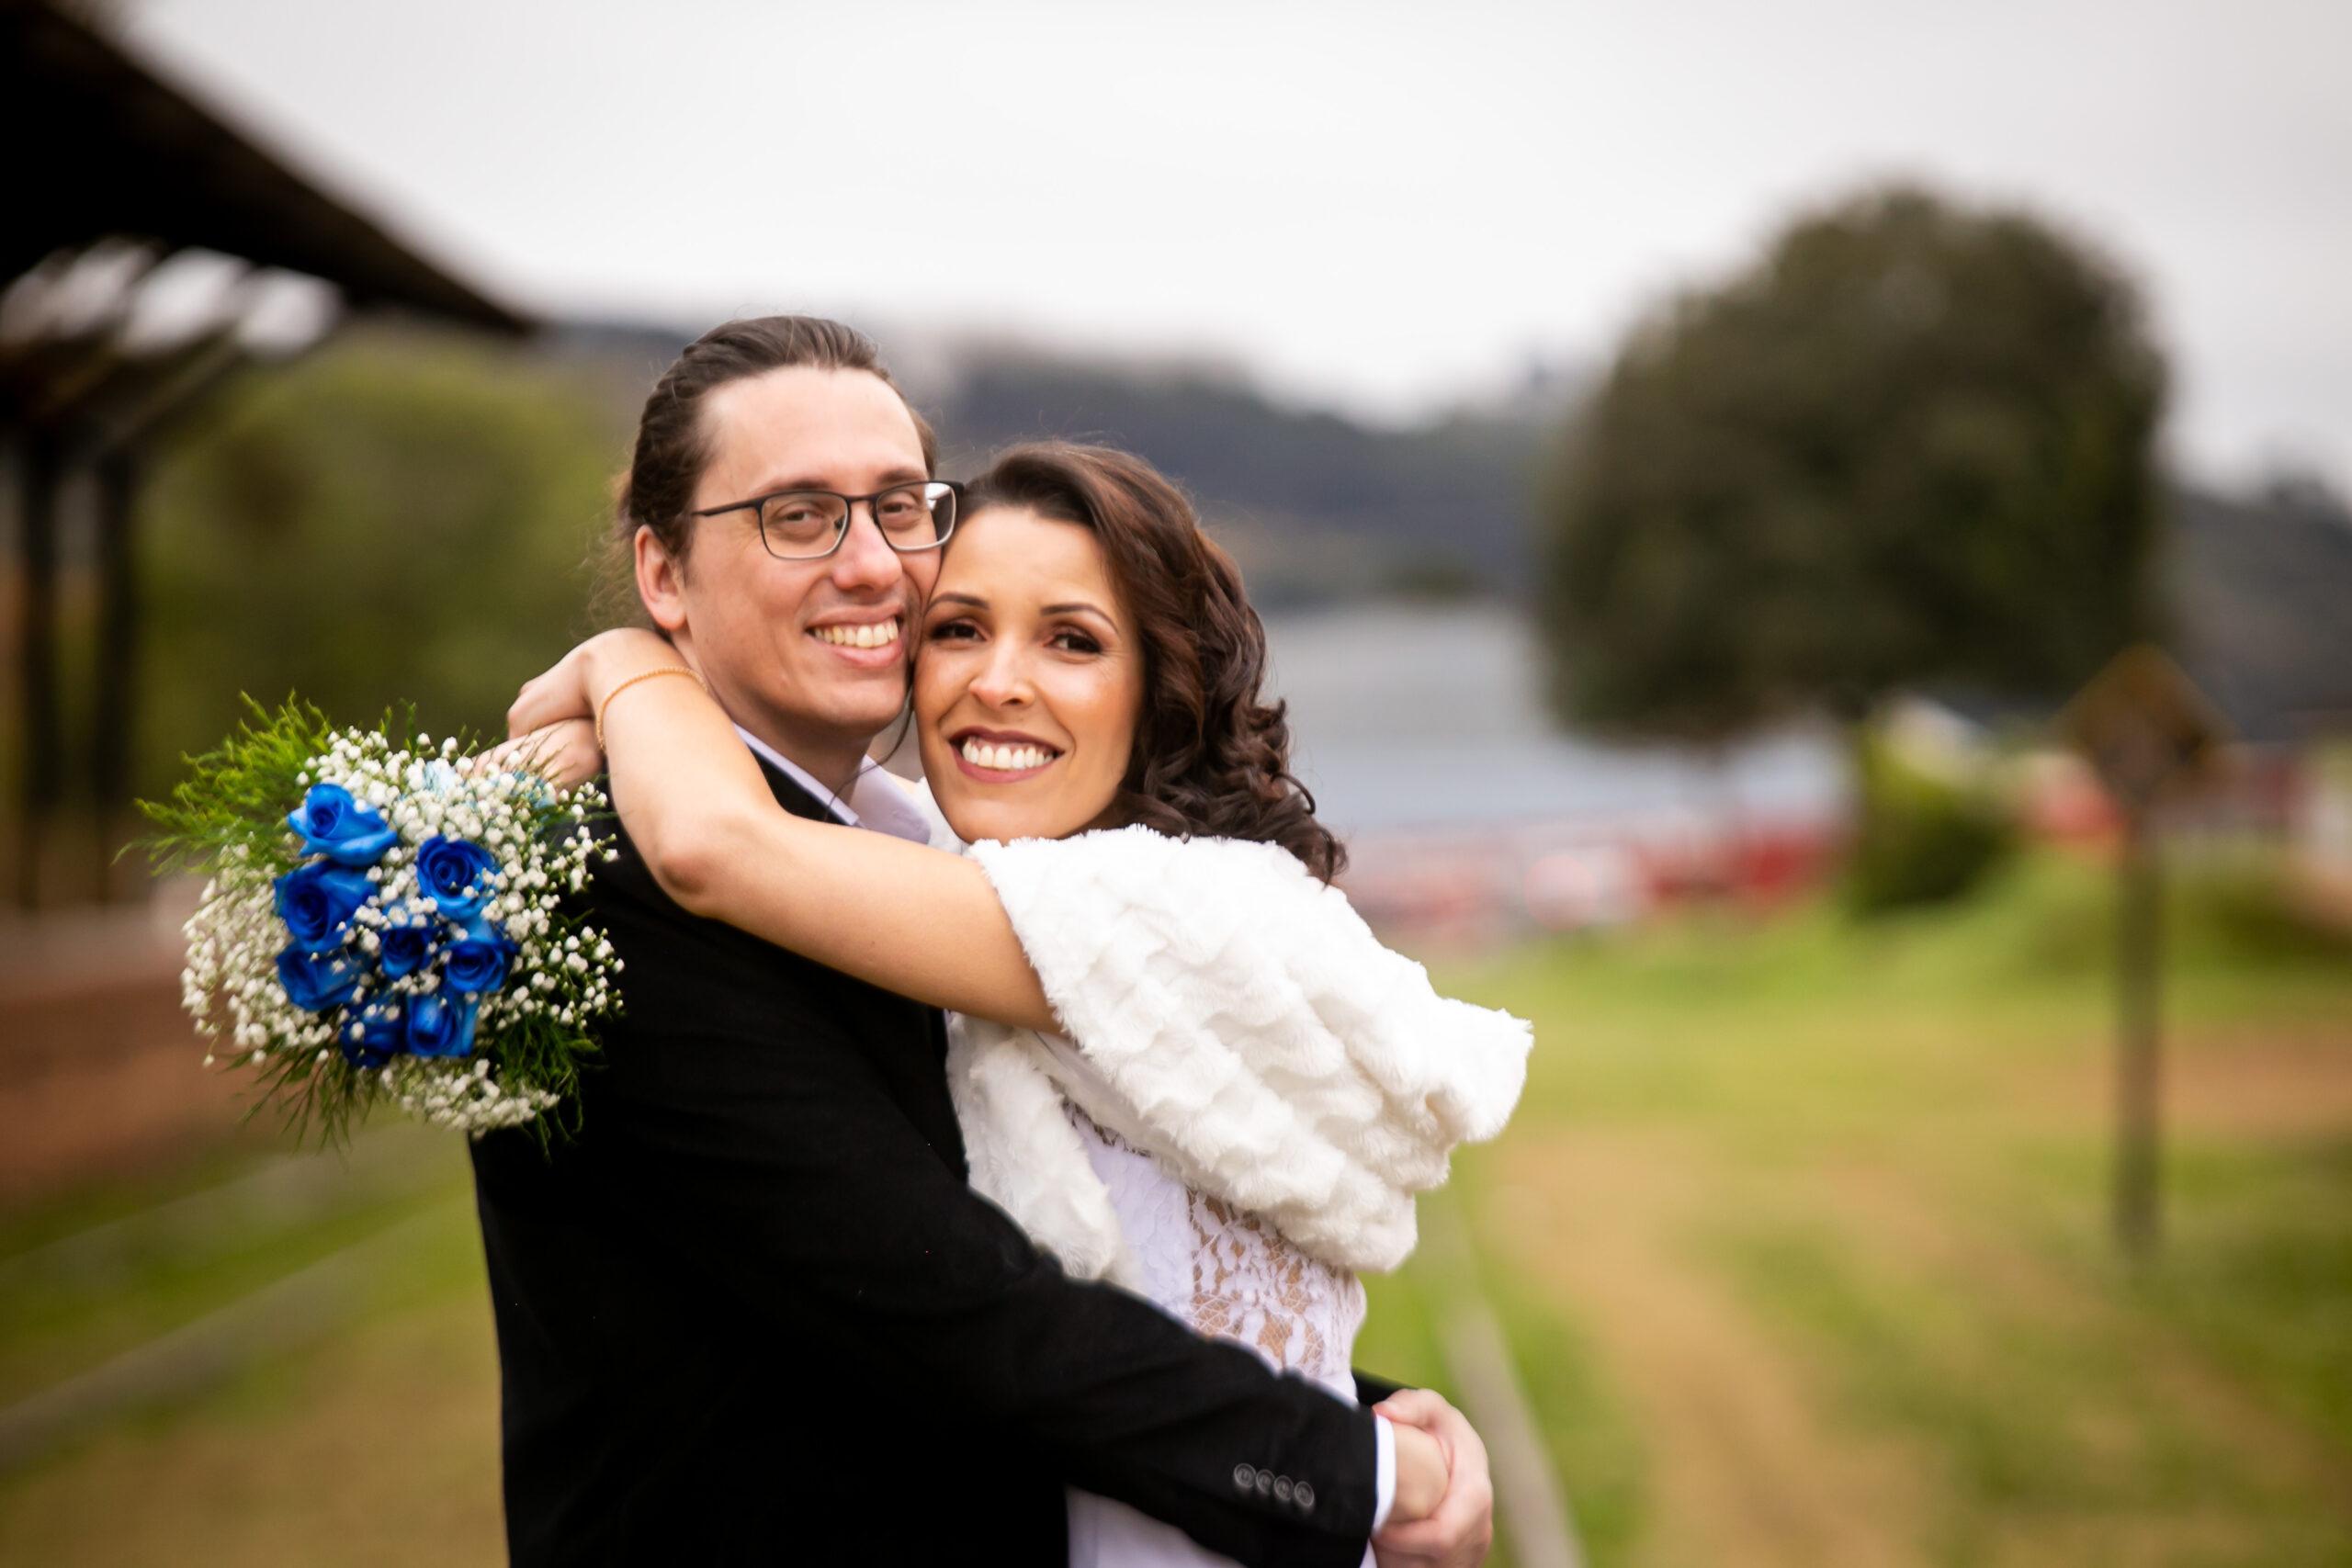 Celenita Ramalho e Guilherme Fahl Caracini